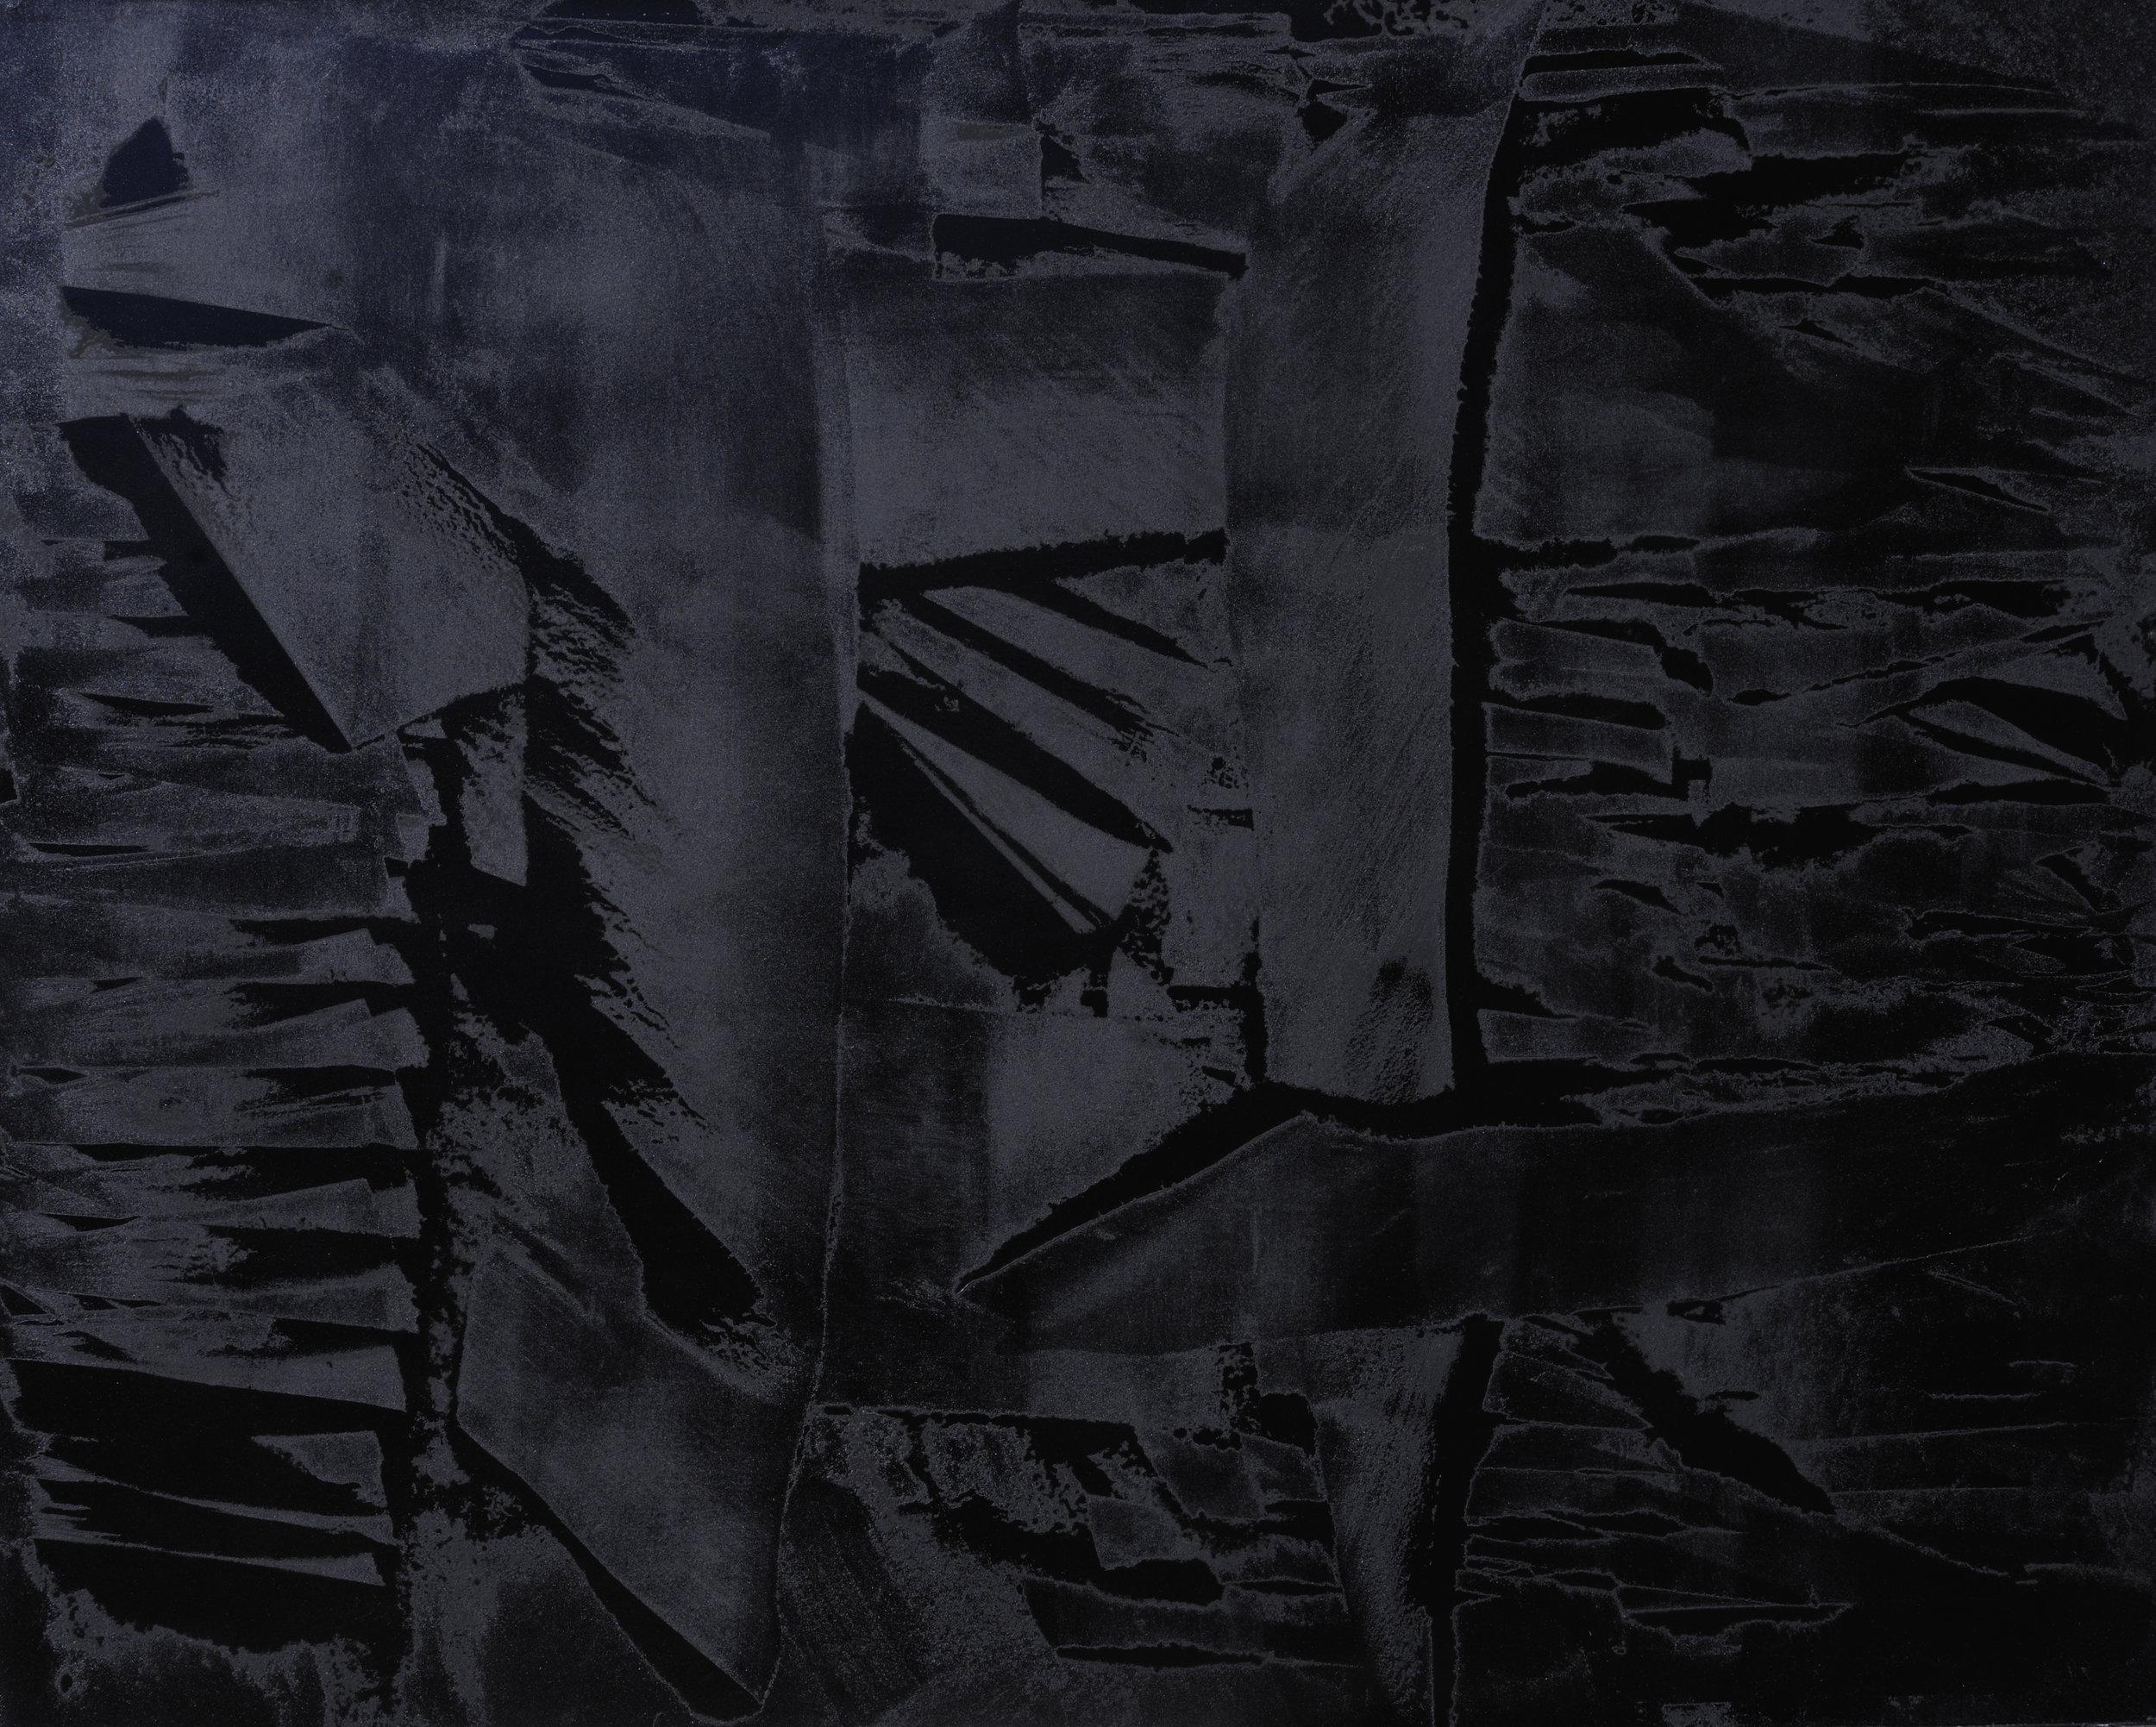 Black Void No. 10, 2016, 162cm x 130cm 100F, Oil on Canvas.jpg